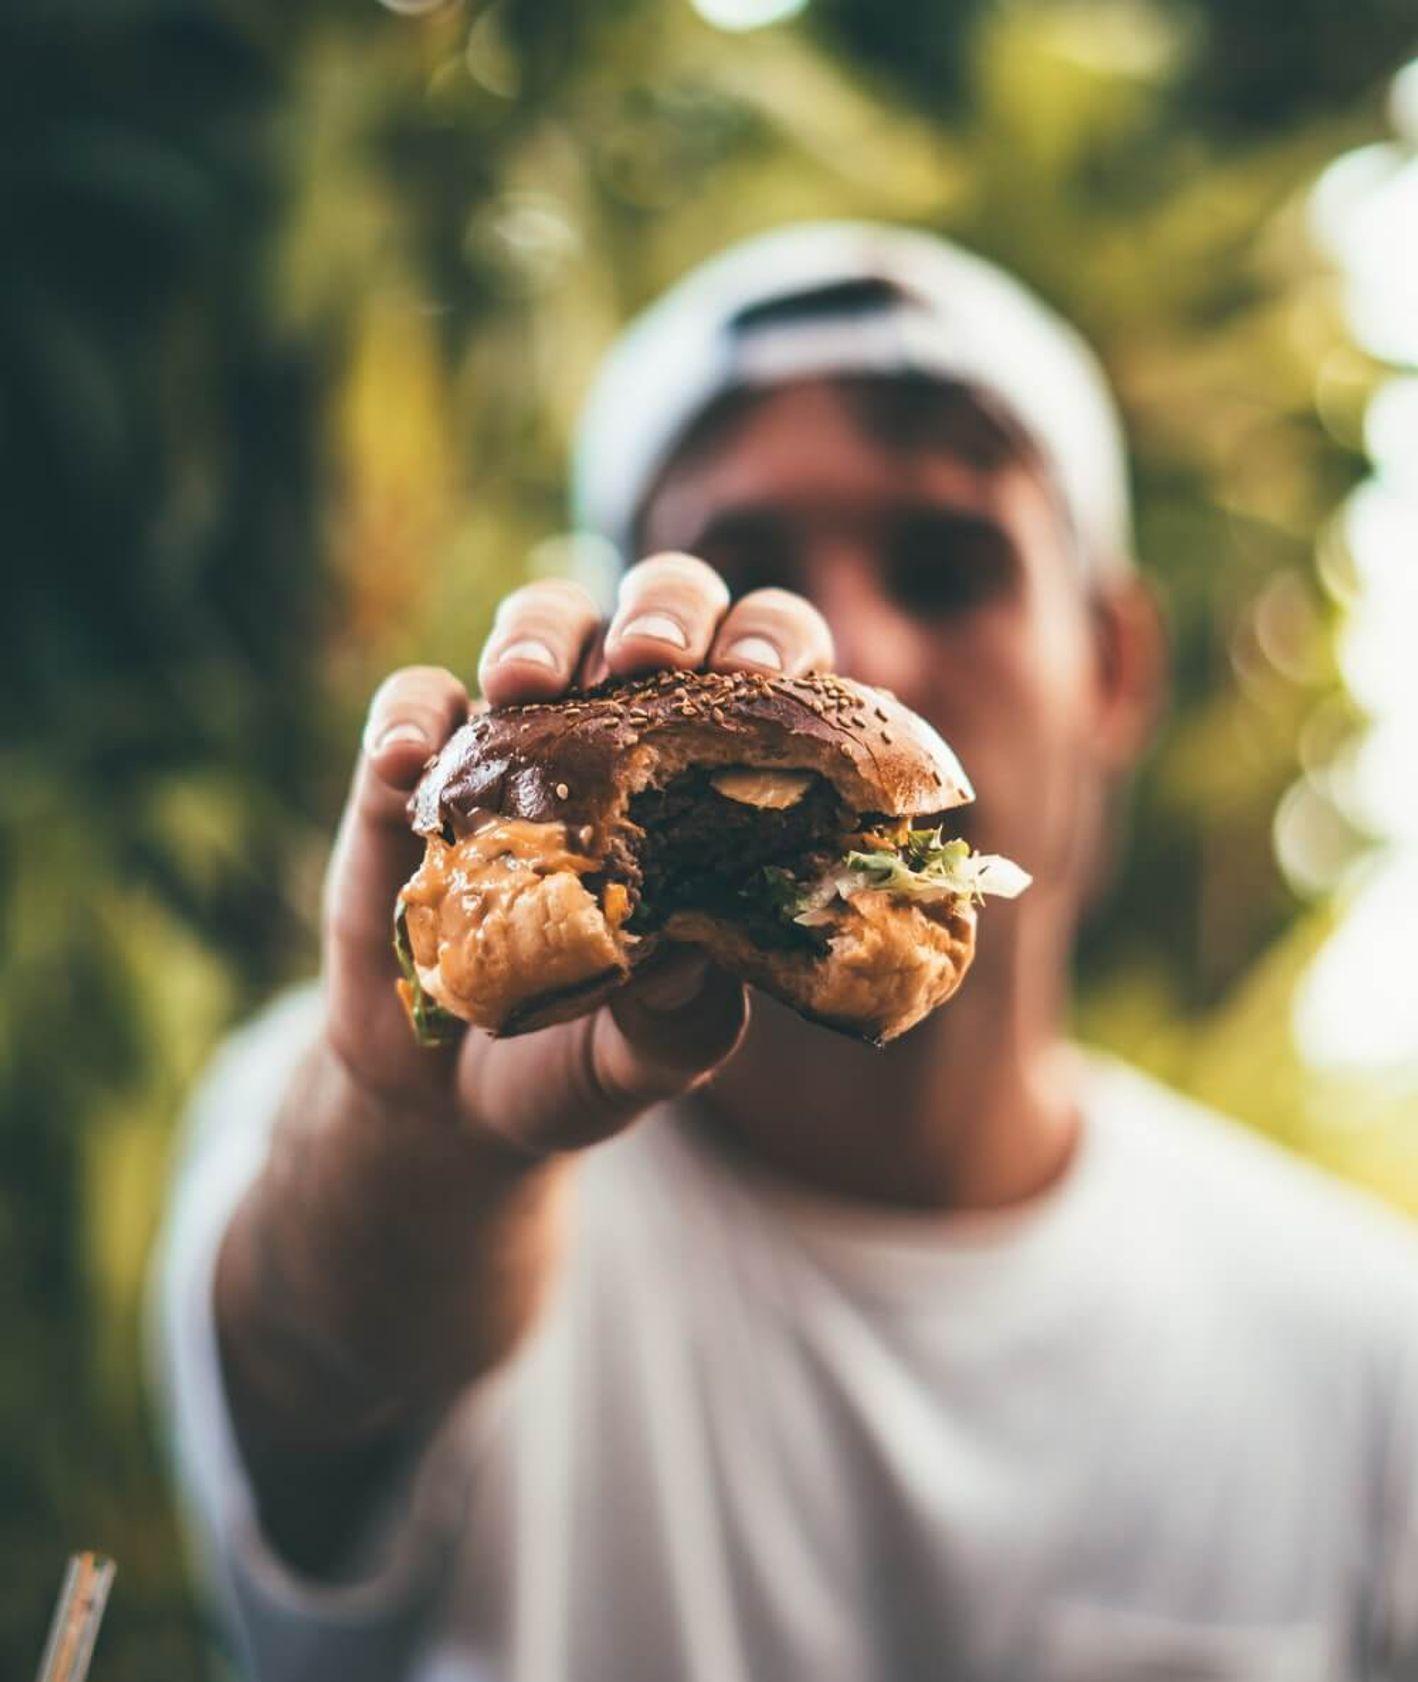 Mężczyzna z hamburgerem : Oliver Sjöström : Unsplash.com.jpg